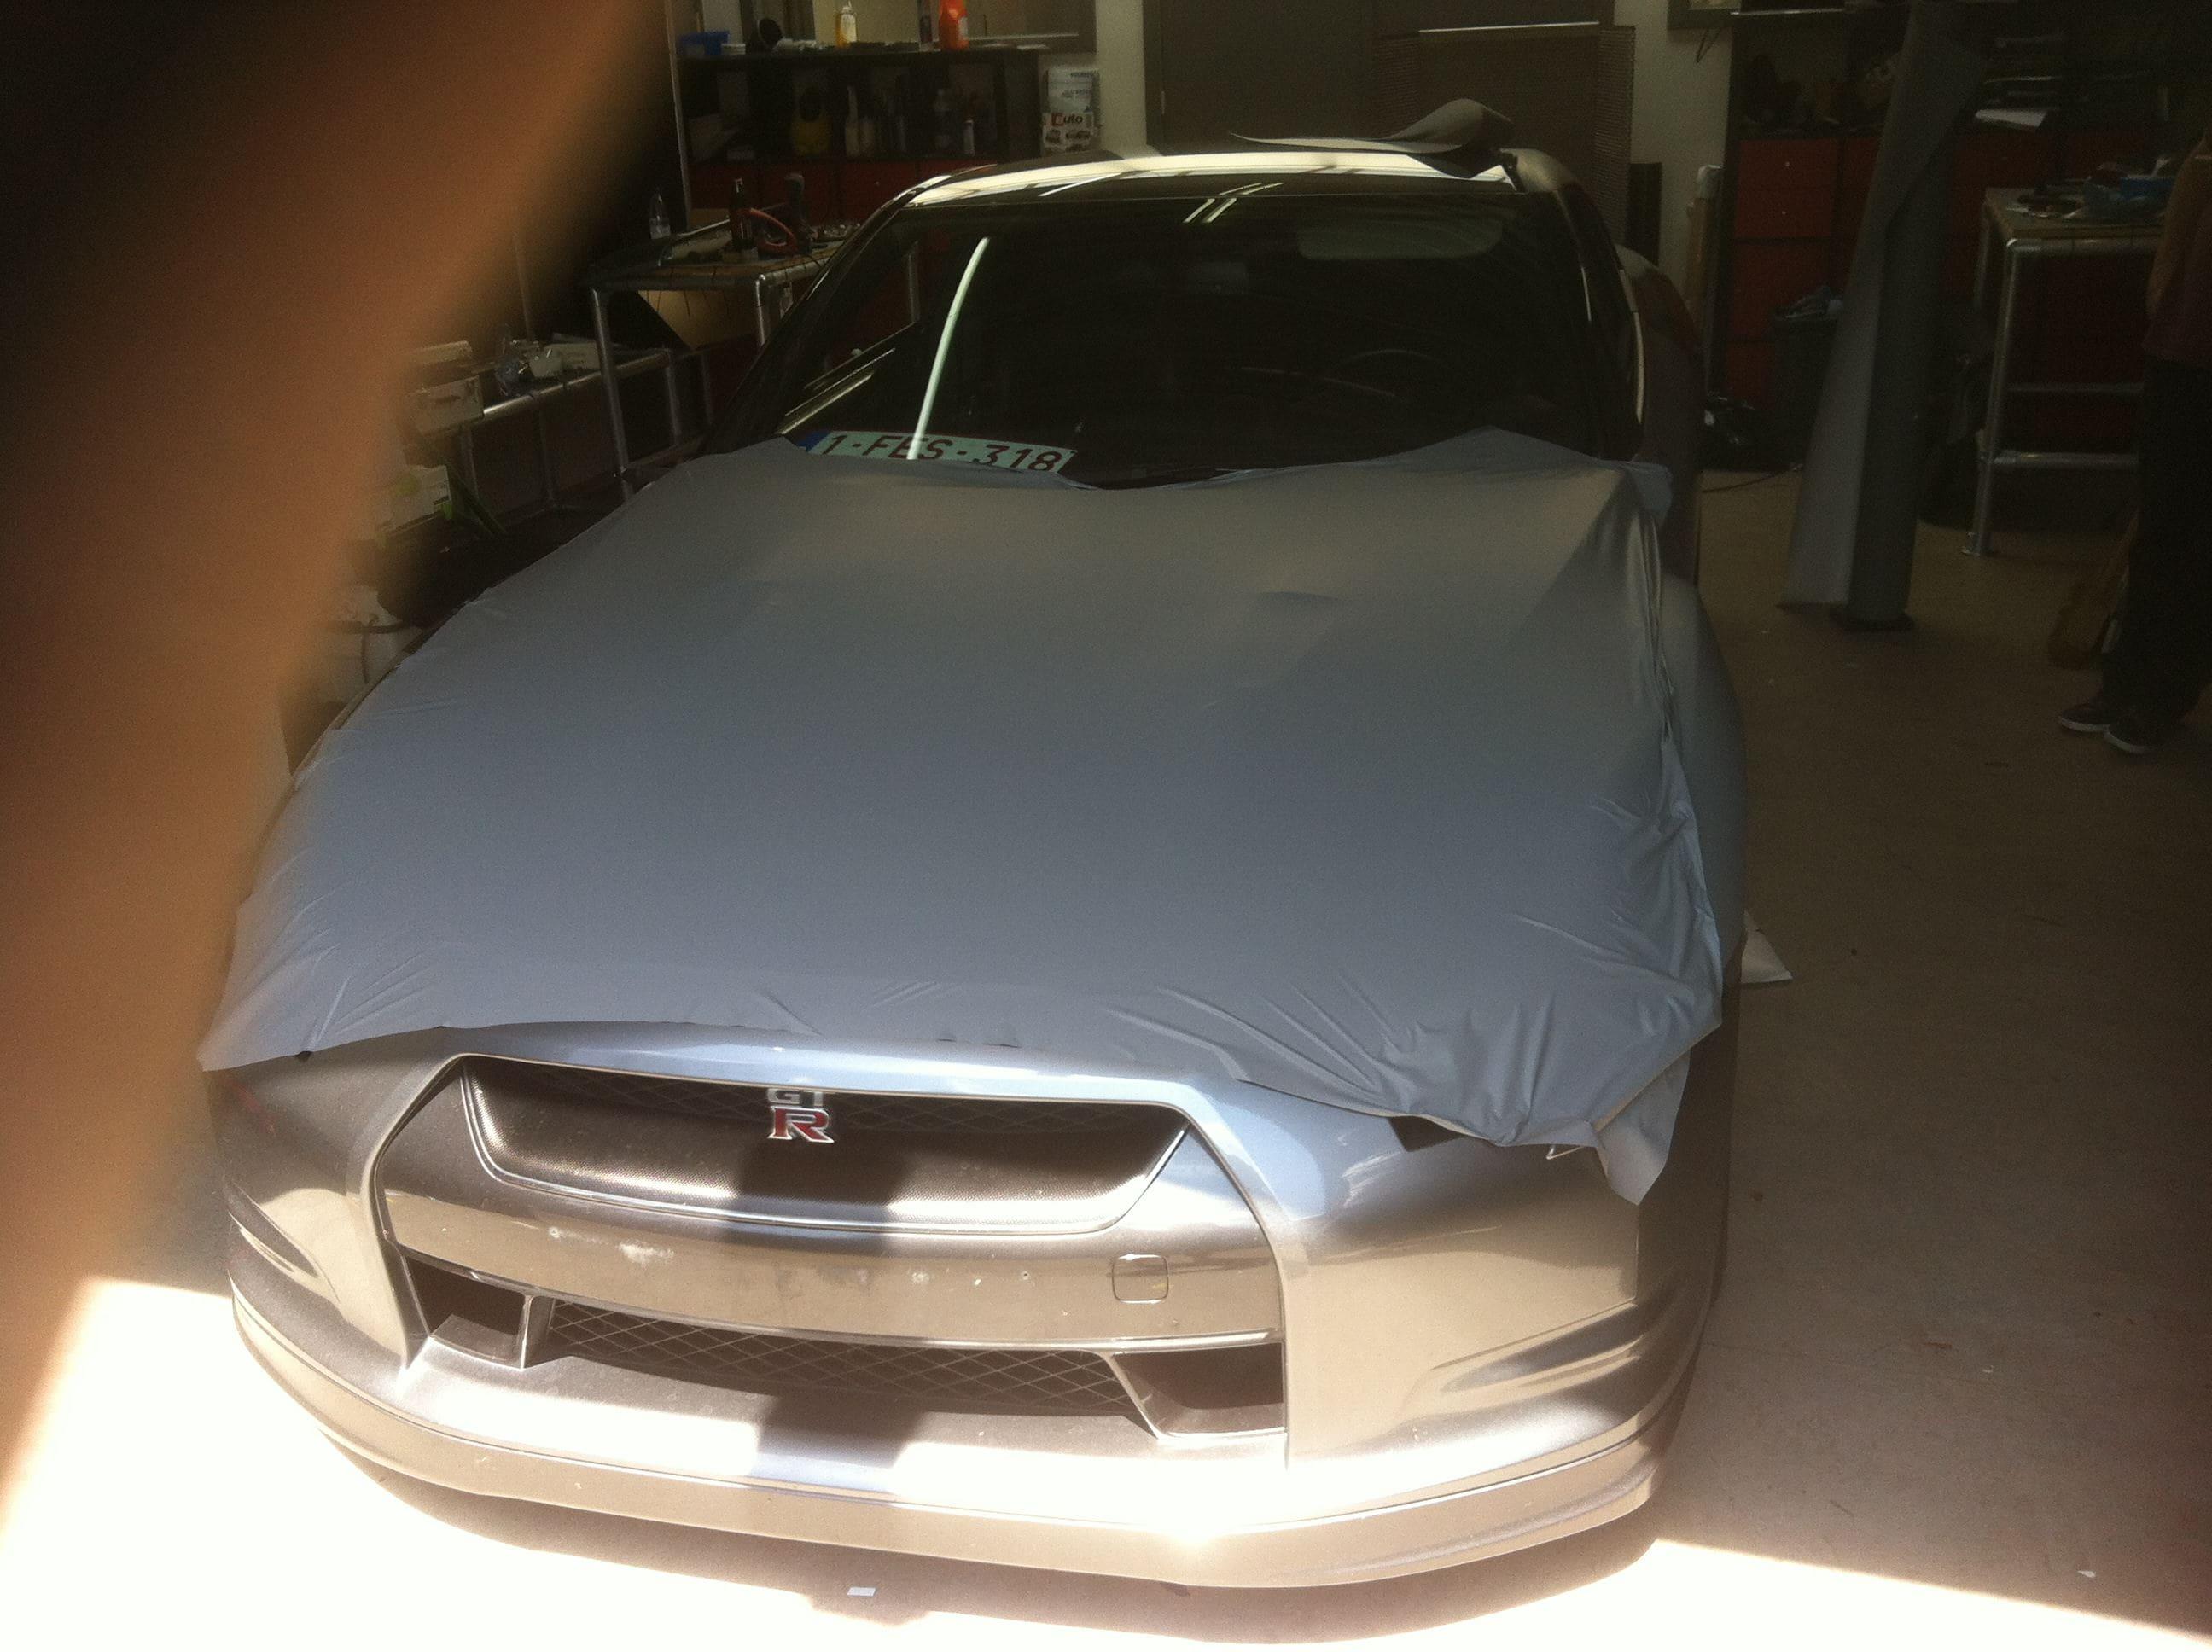 Nissan GT-R met Mat Grijze Wrap, Carwrapping door Wrapmyride.nu Foto-nr:6547, ©2020